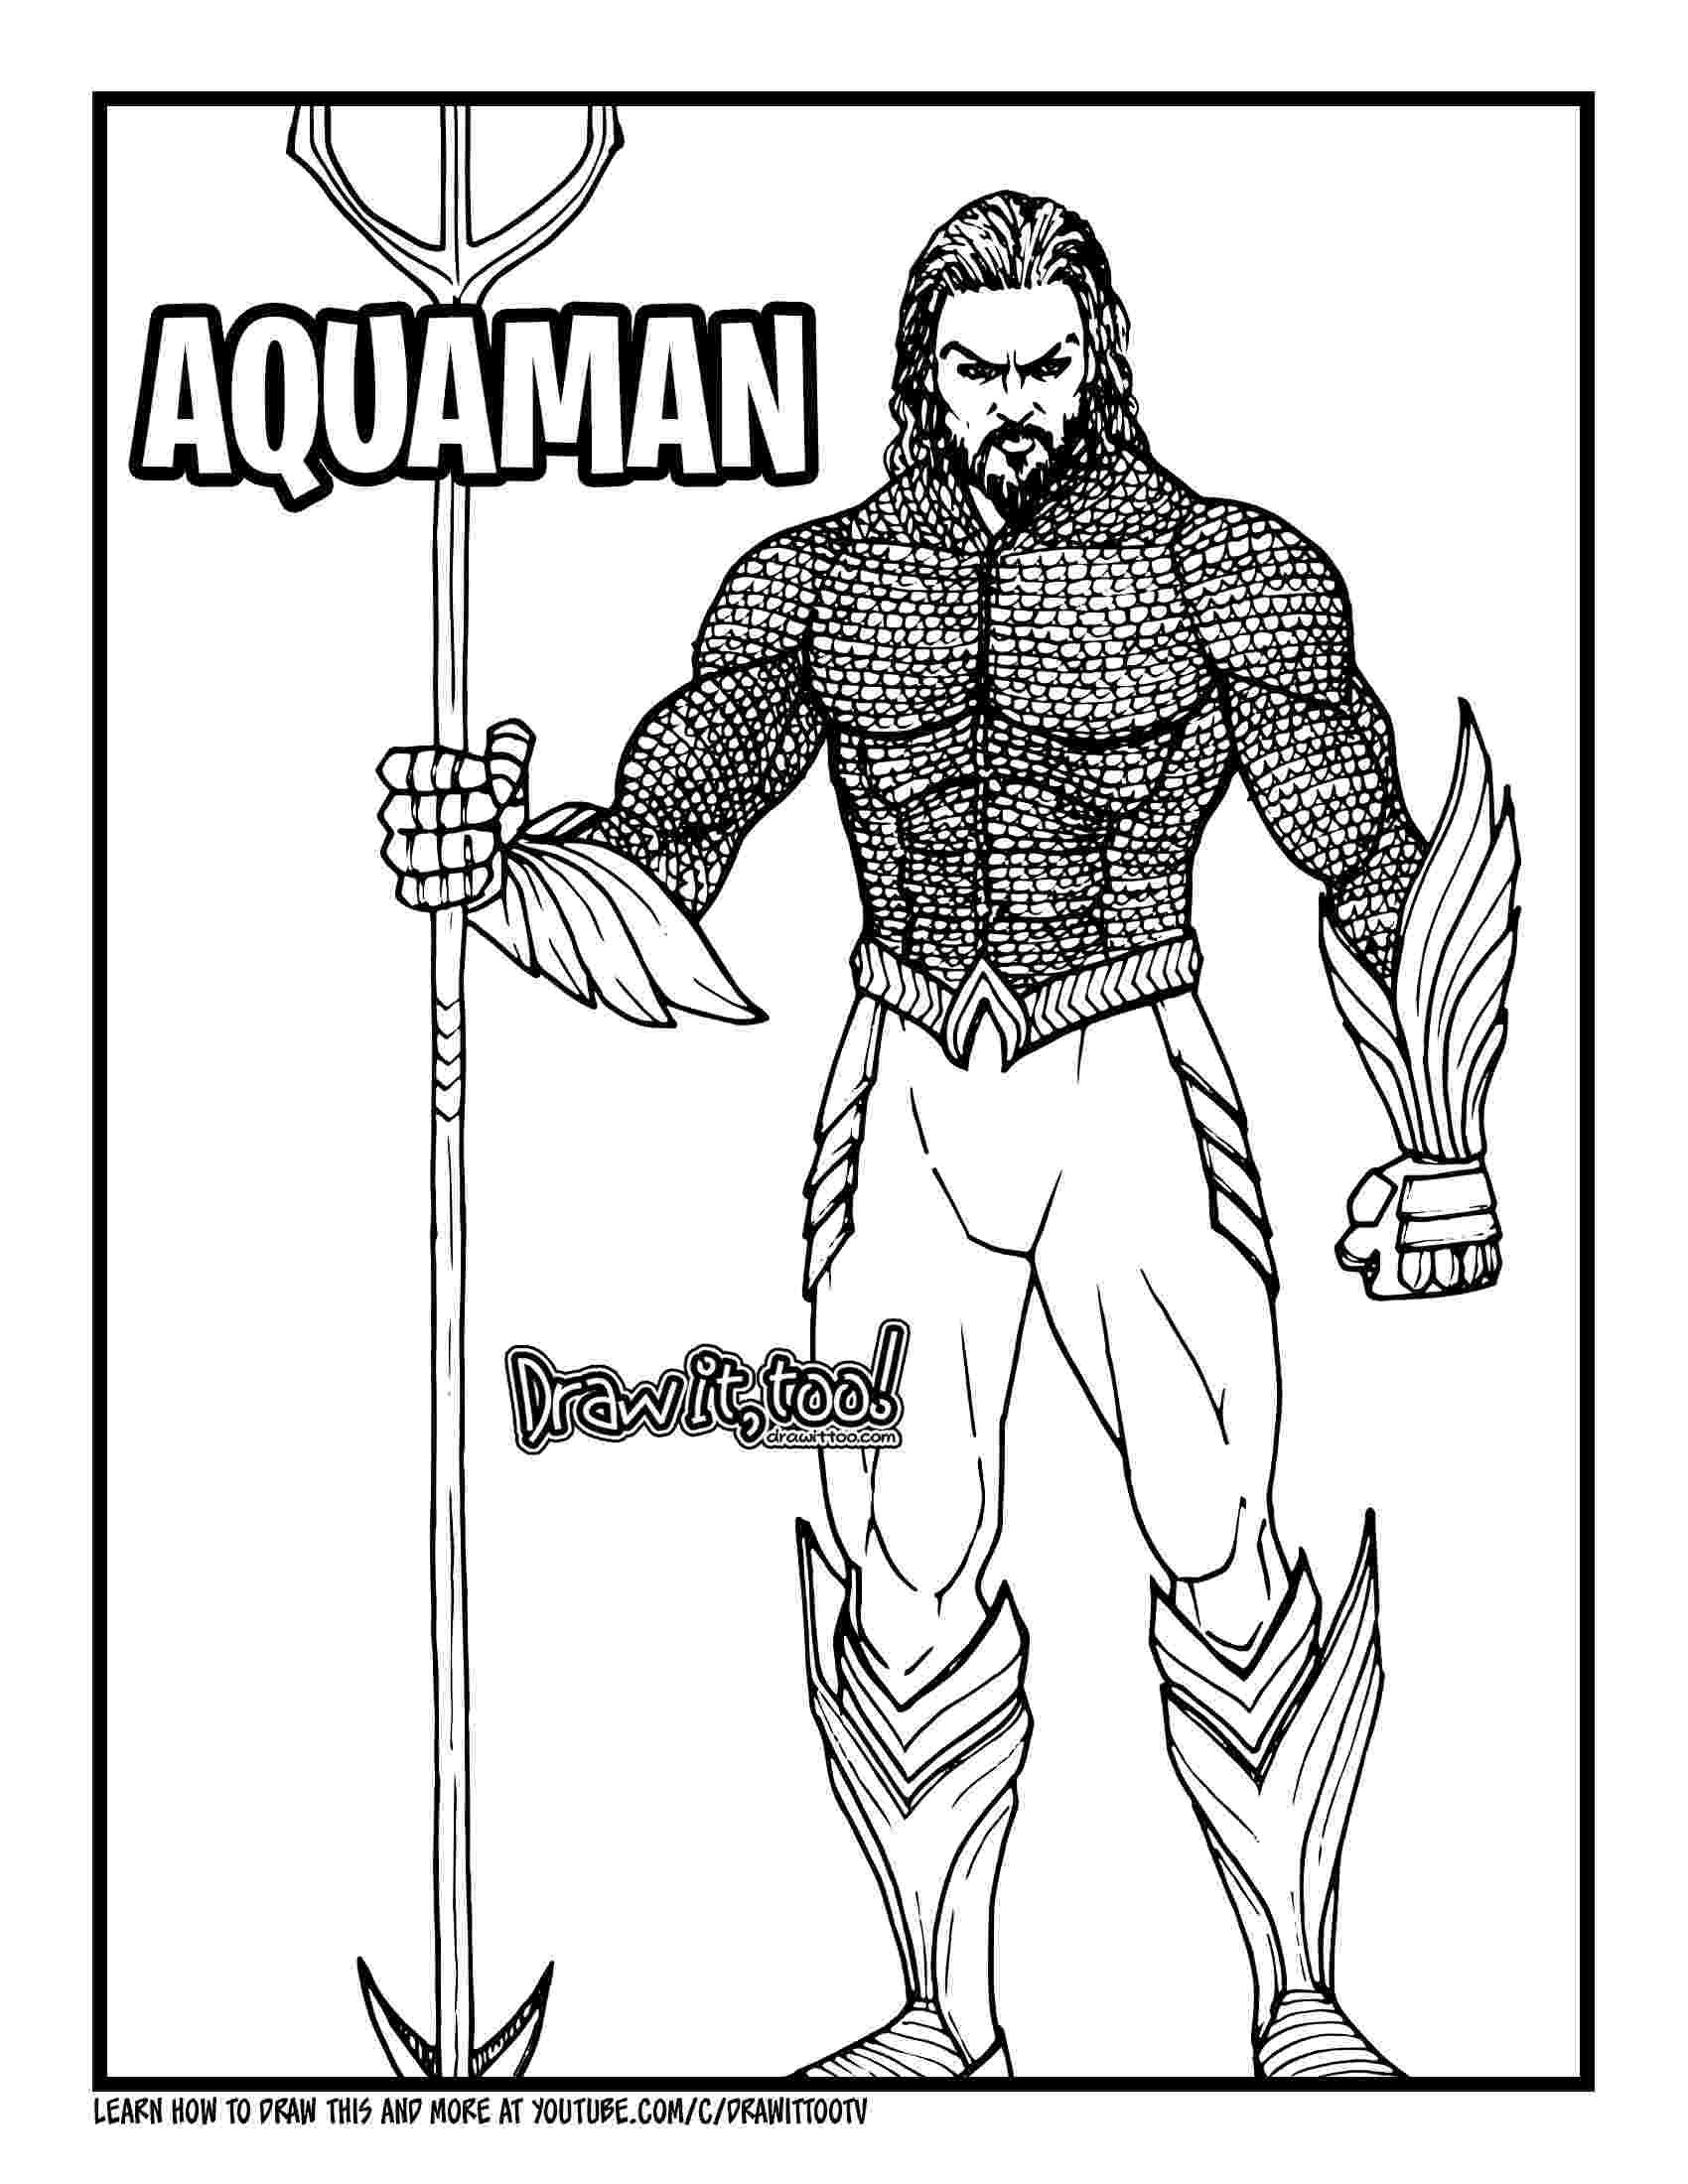 aquaman coloring pages aquaman coloring pages download and print aquaman aquaman pages coloring